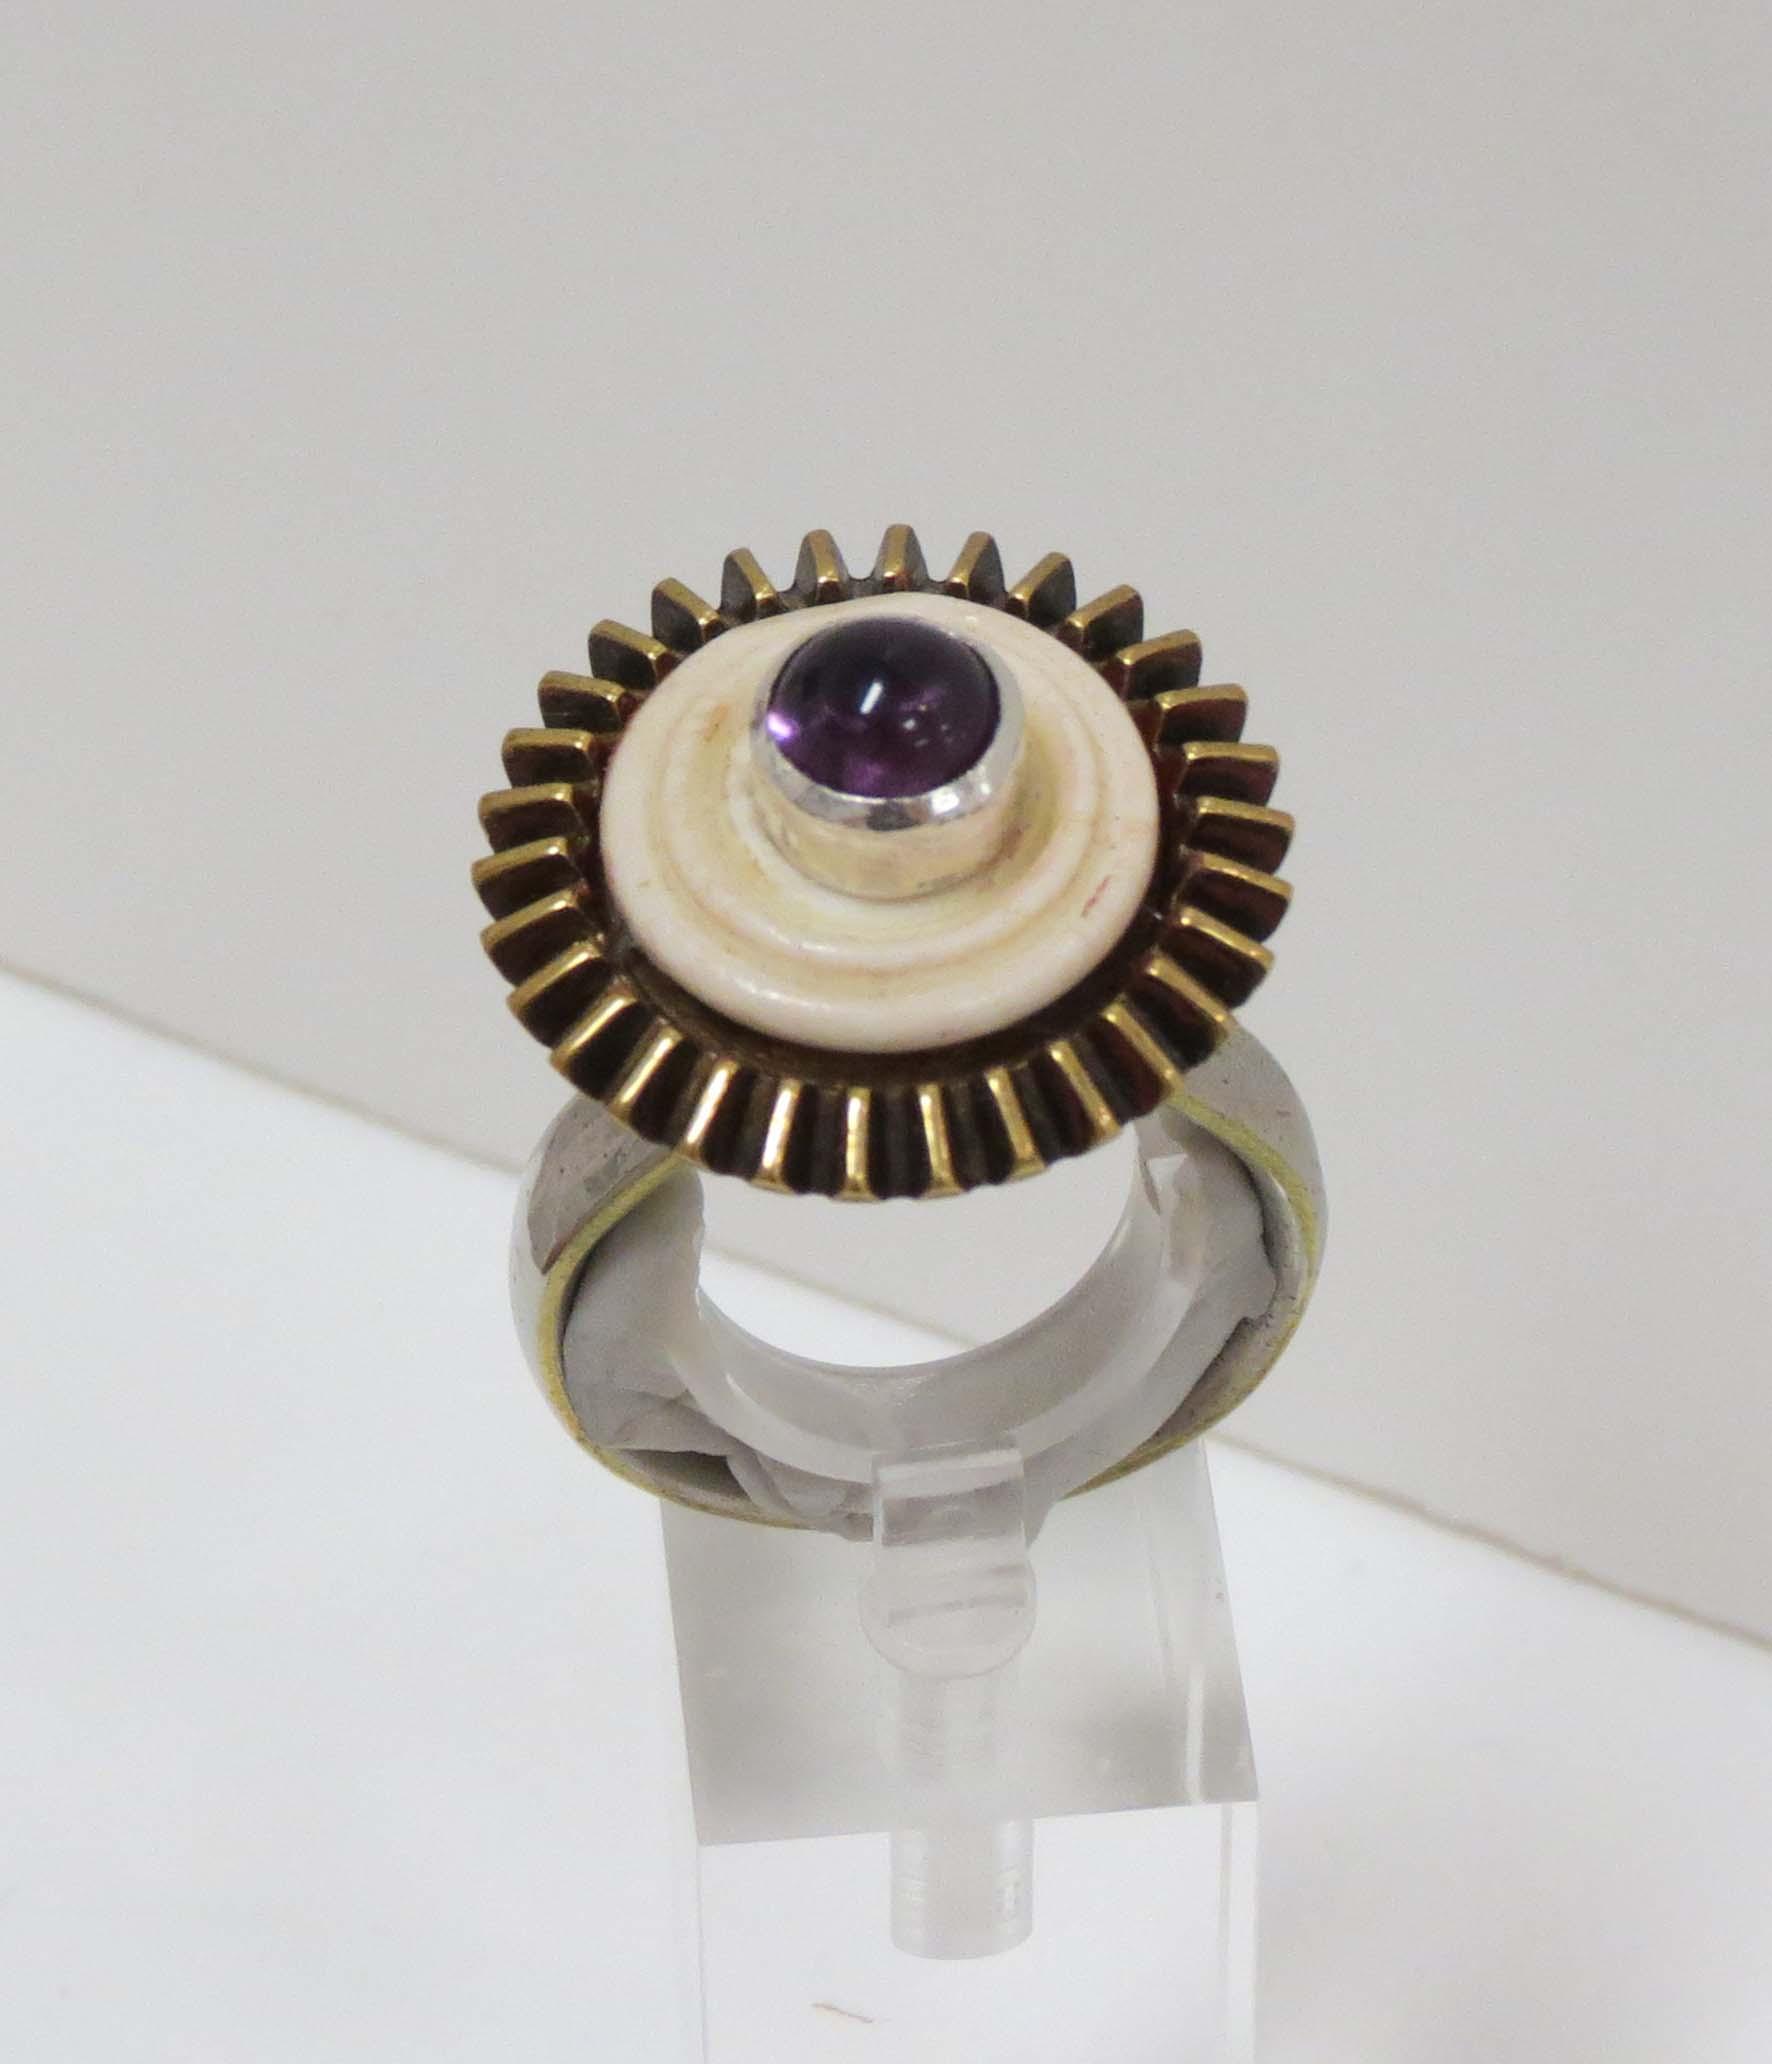 25. Kathy Aspinall, 'Royal Cog', 2018, steel, brass, bone, silver, amethyst, Man's ring (size Z), $300